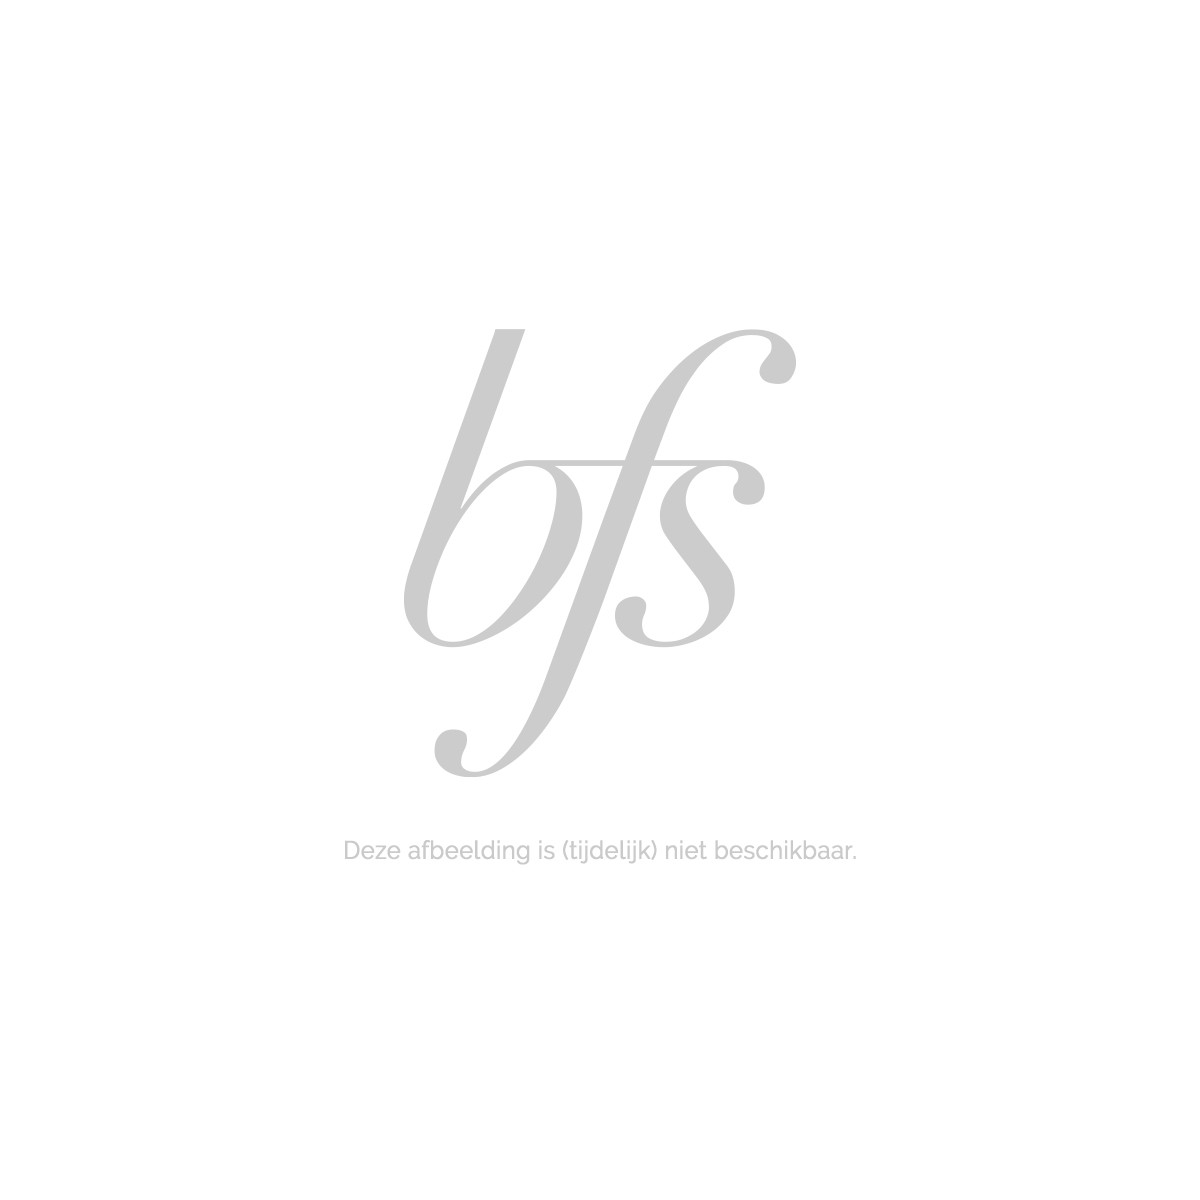 Beardburys Baardshampoo In Pompflacon 150 Ml